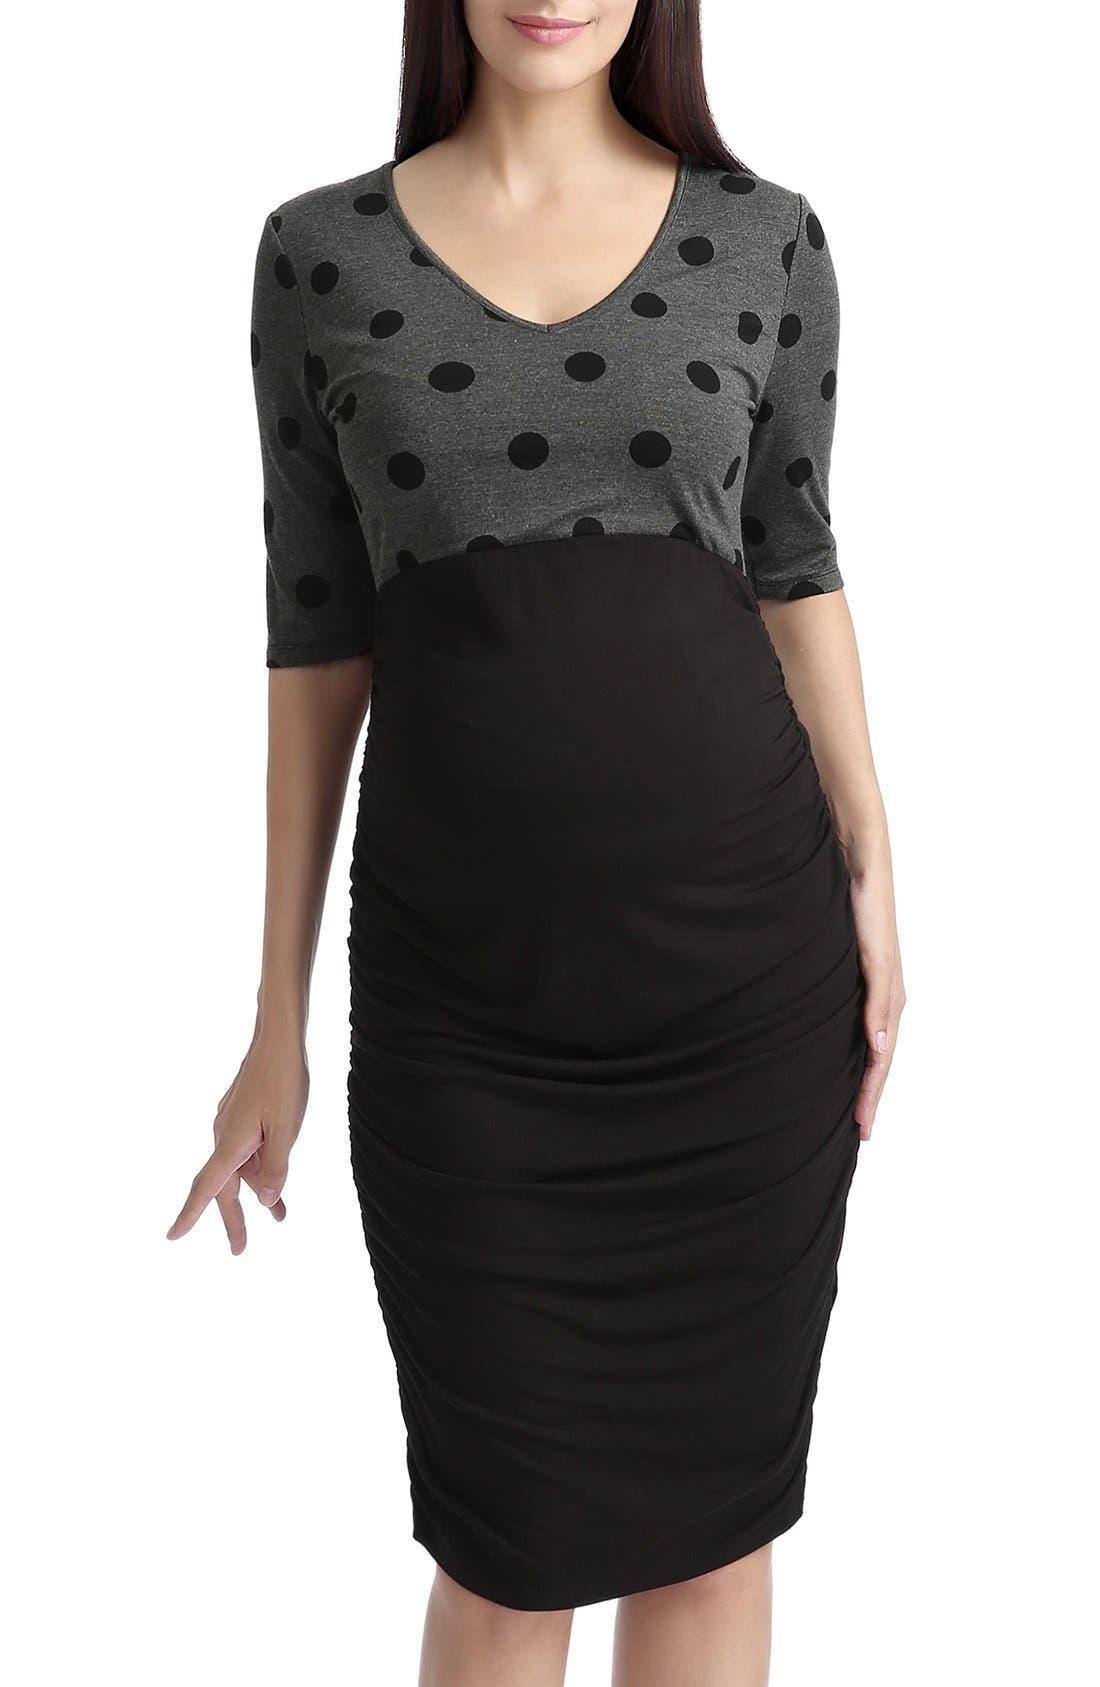 Alternate Image 1 Selected - Kimi and Kai 'Farrah' Maternity Body-Con Dress